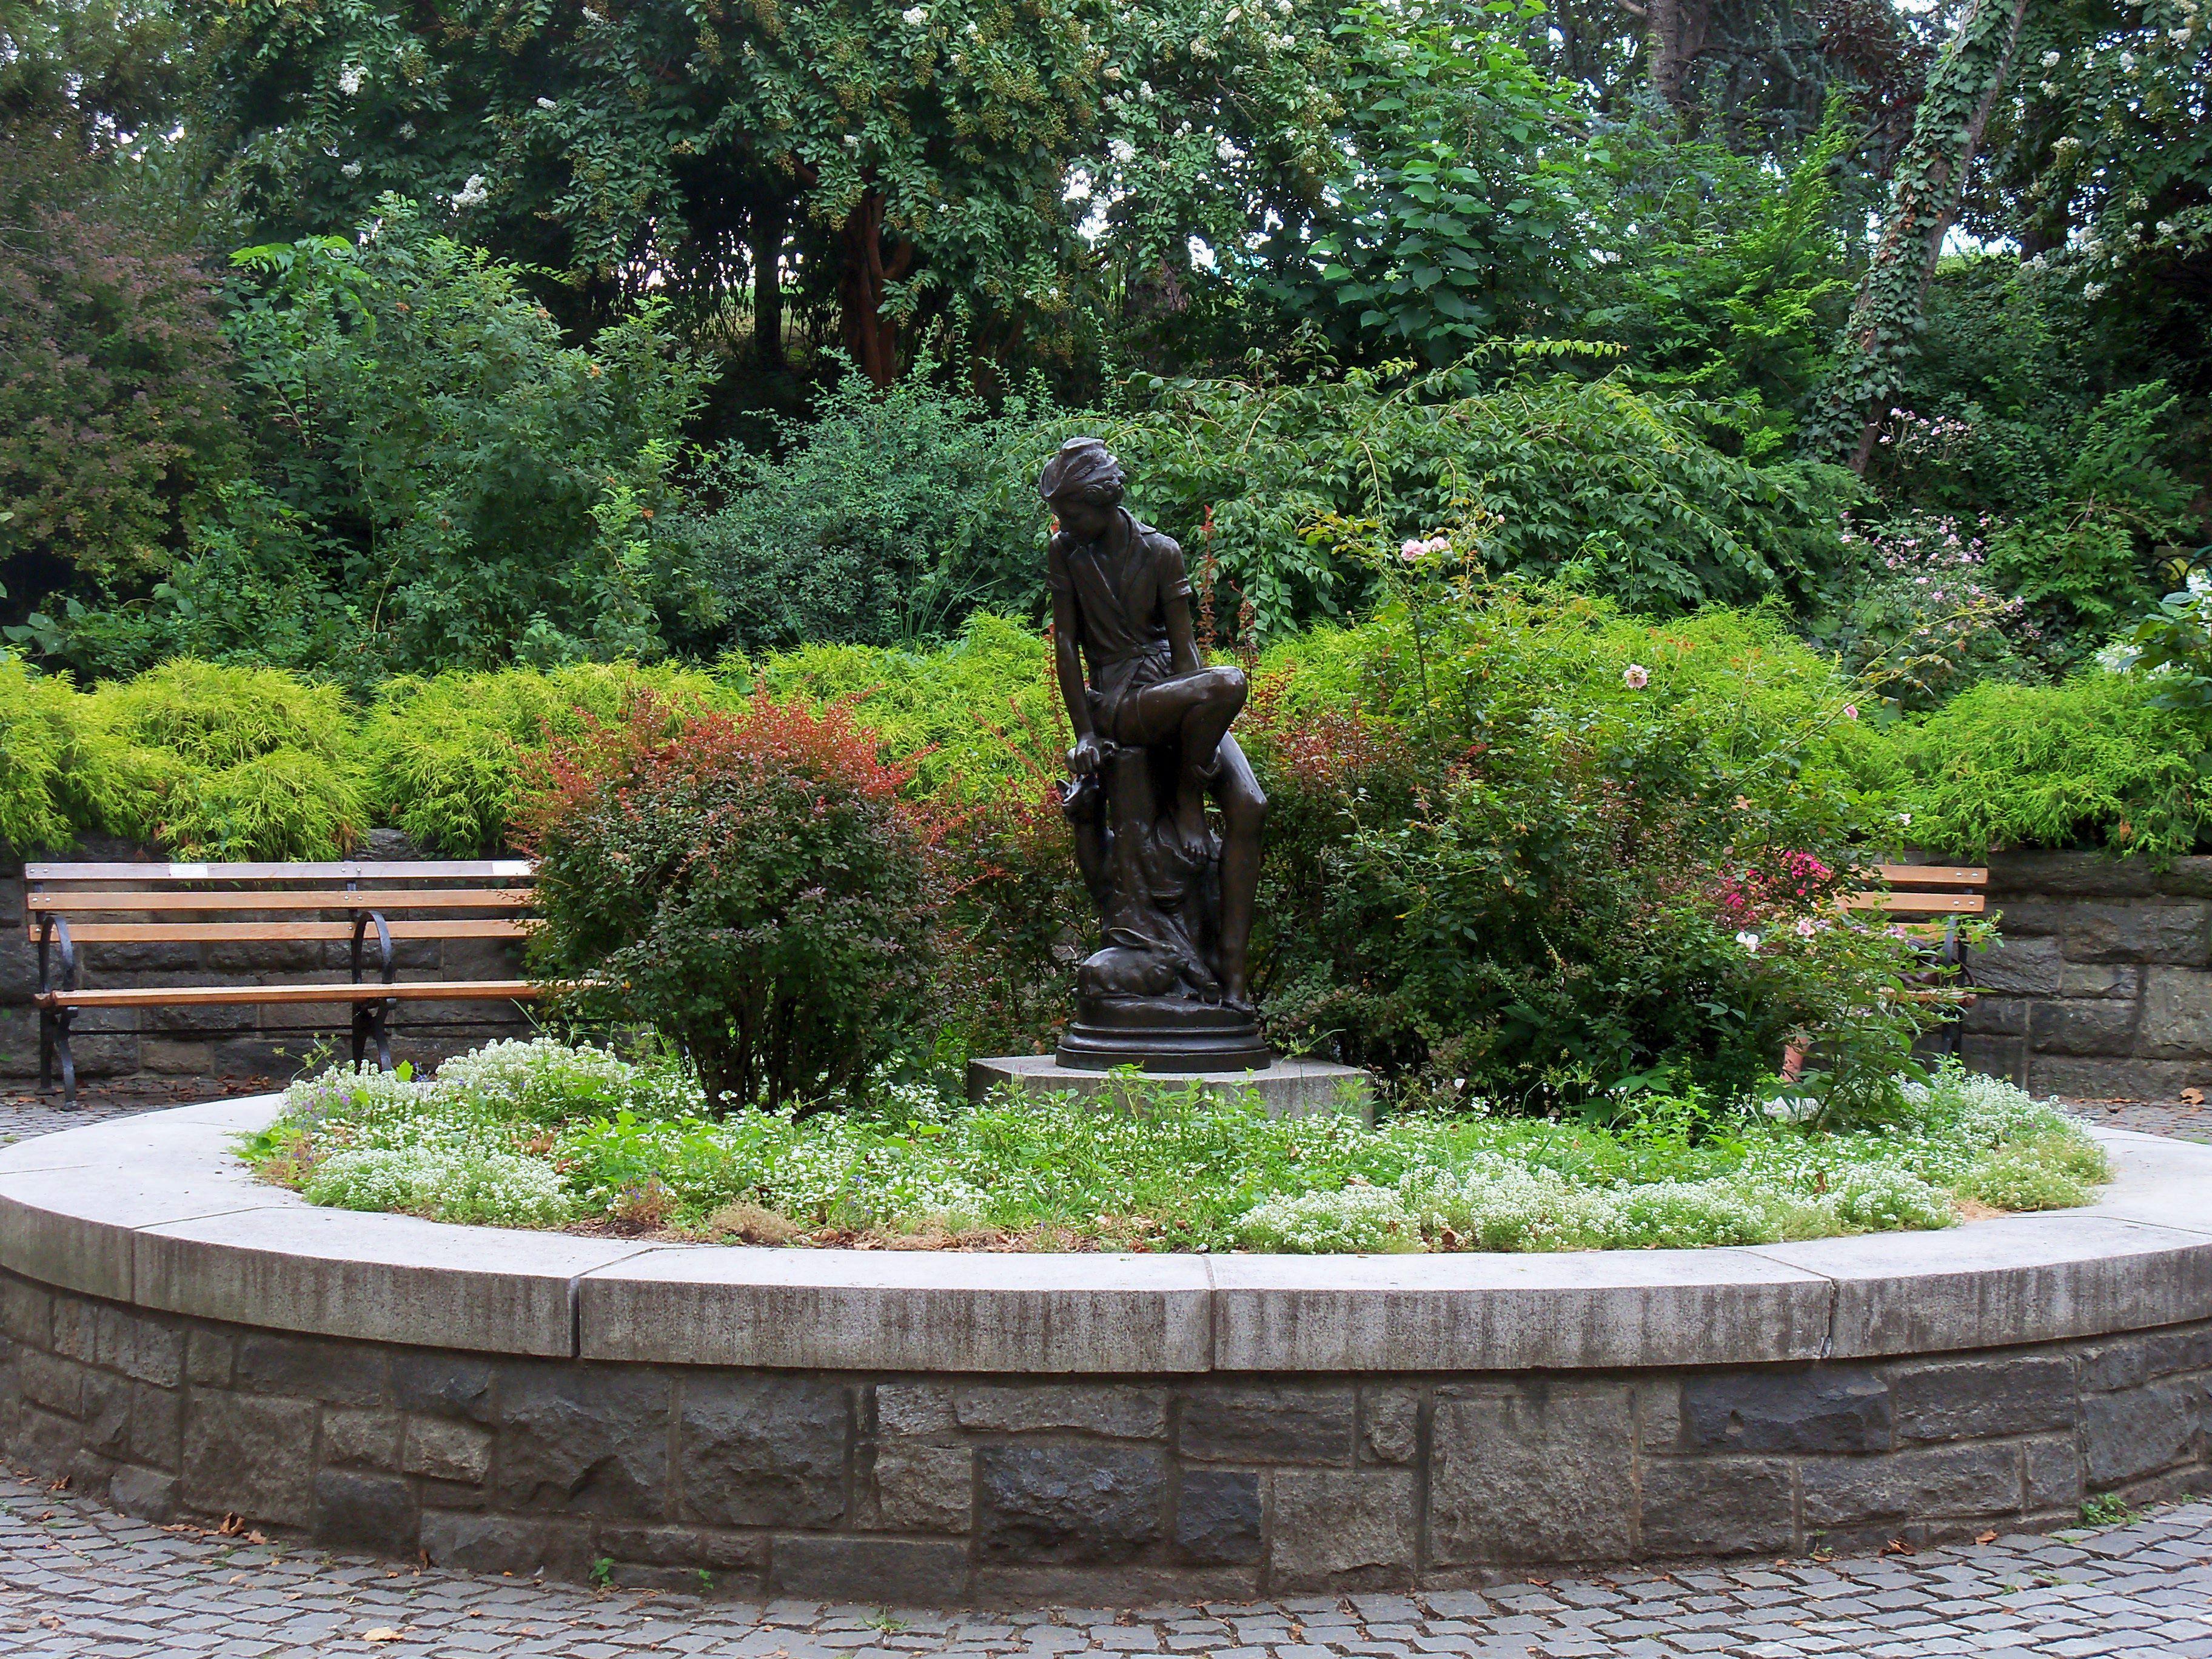 Carl Schurz Park